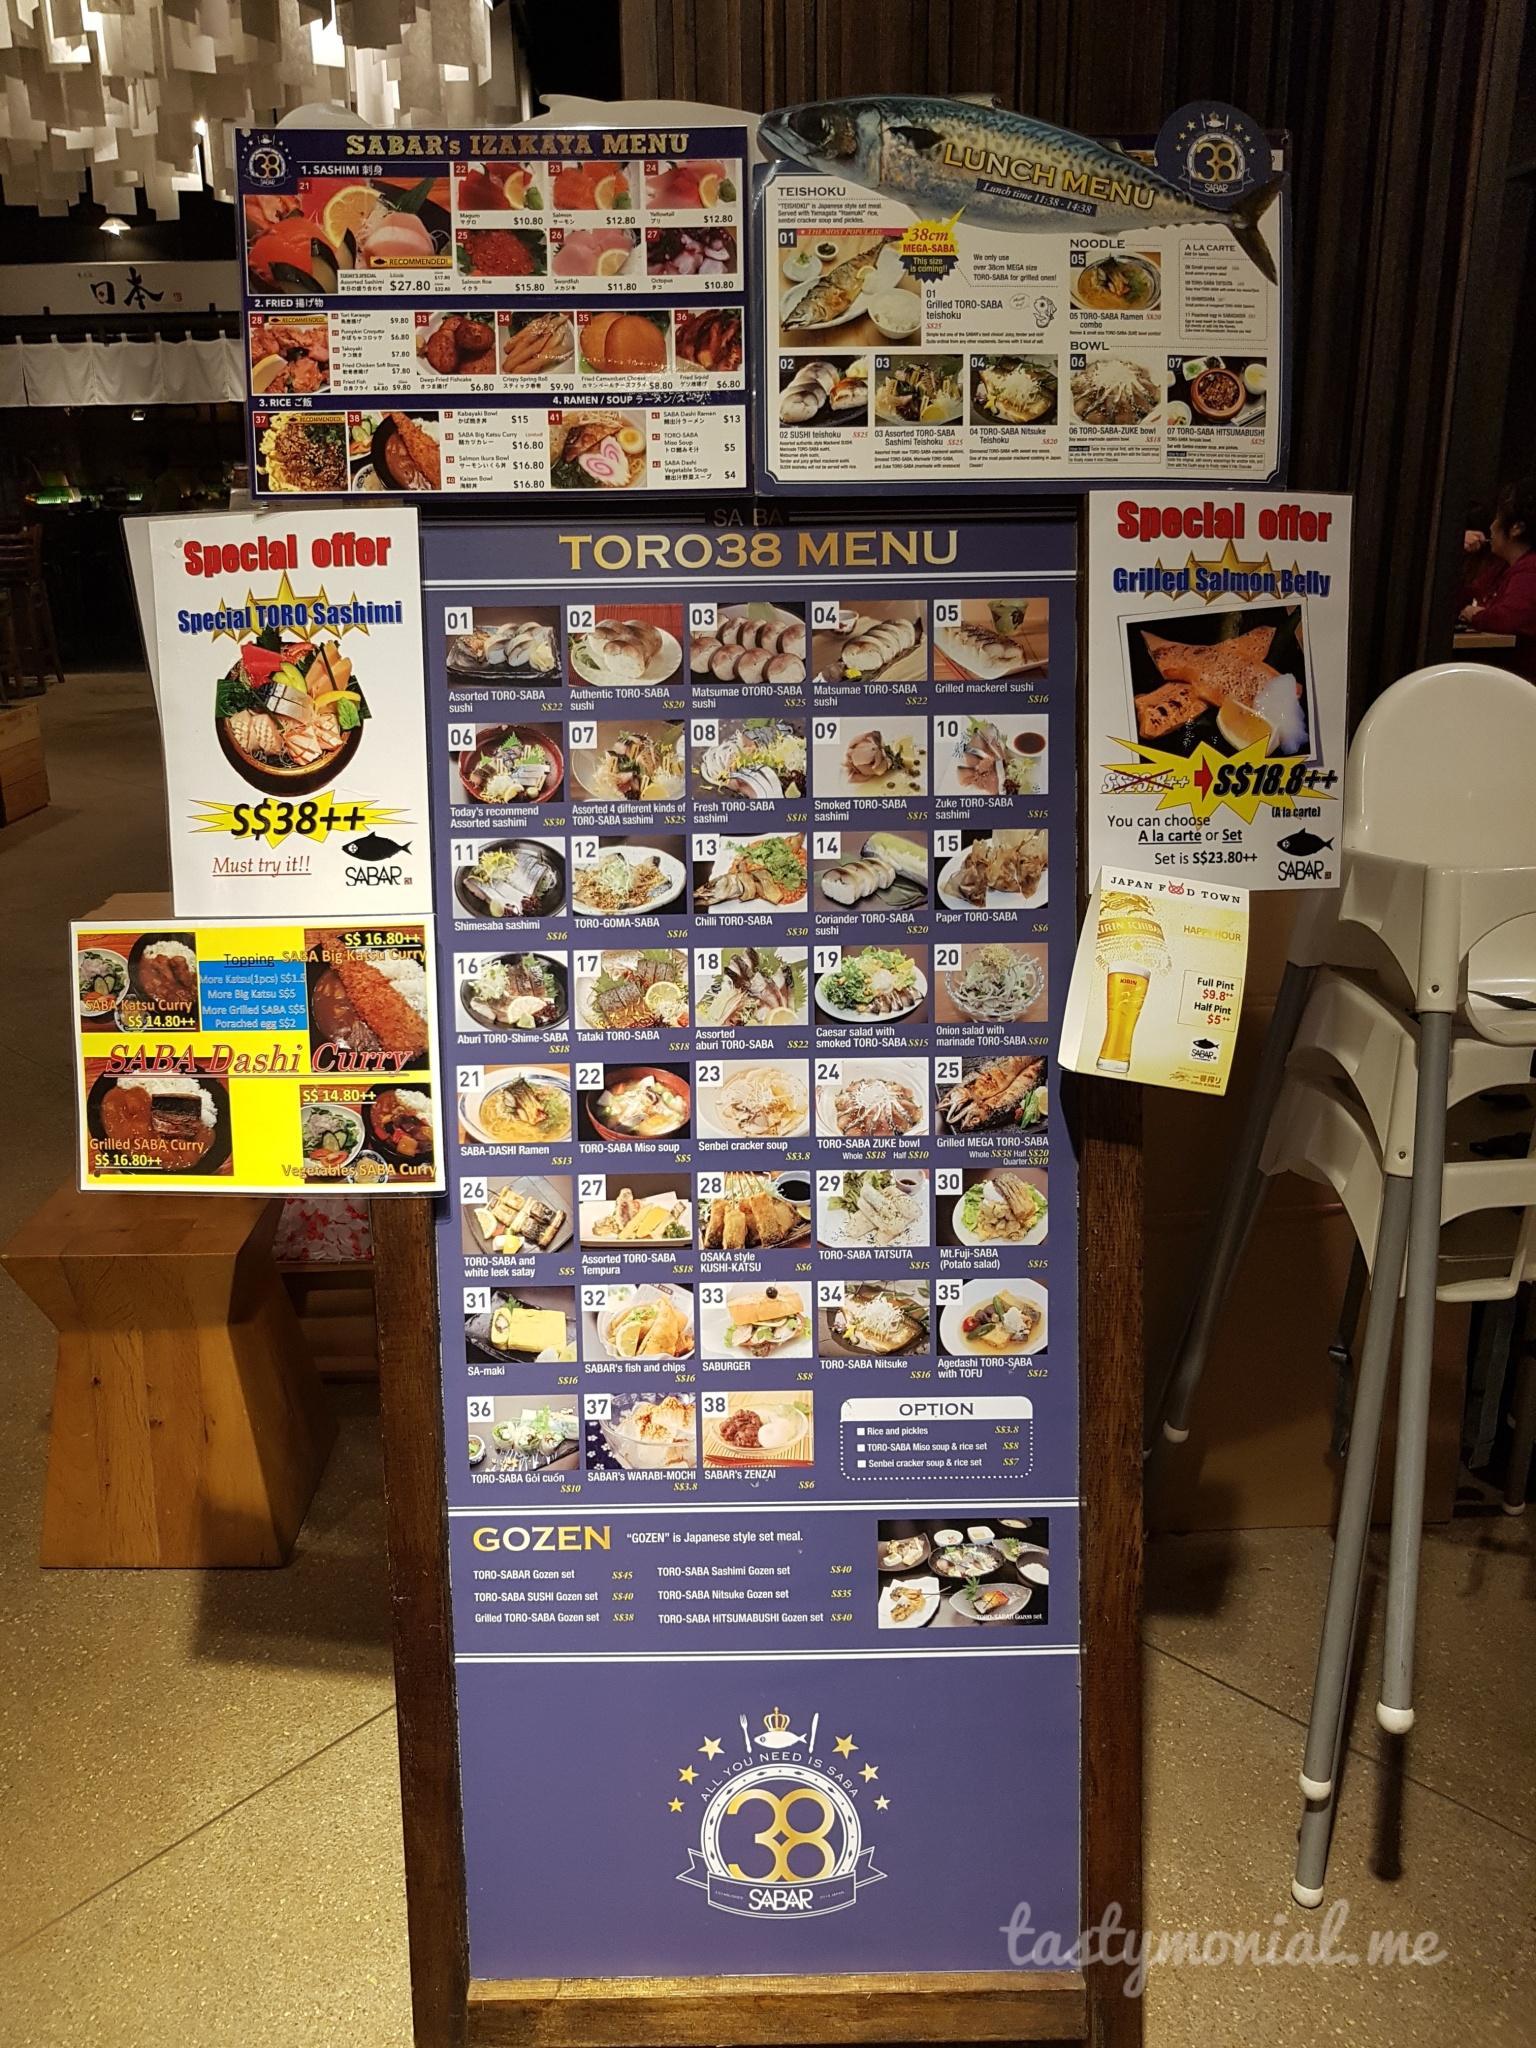 Toro38 Sabar Singapore menu